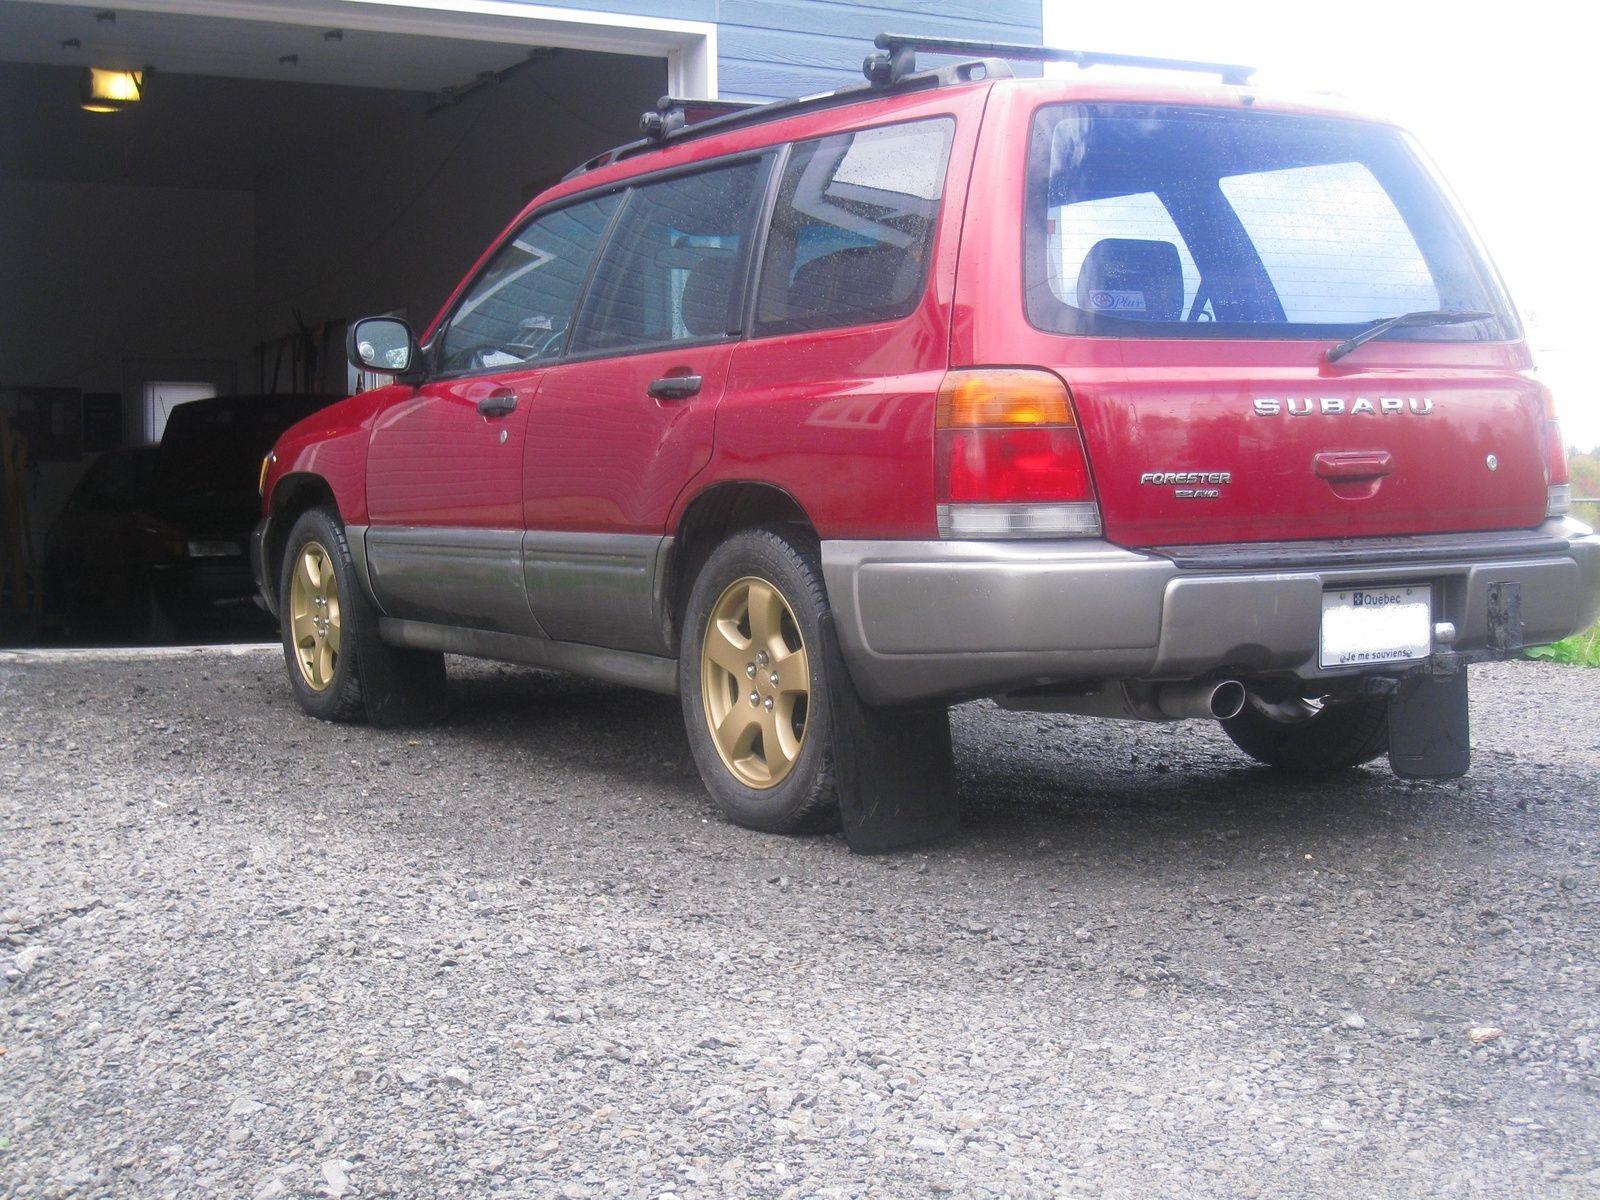 Subaru forester s awd